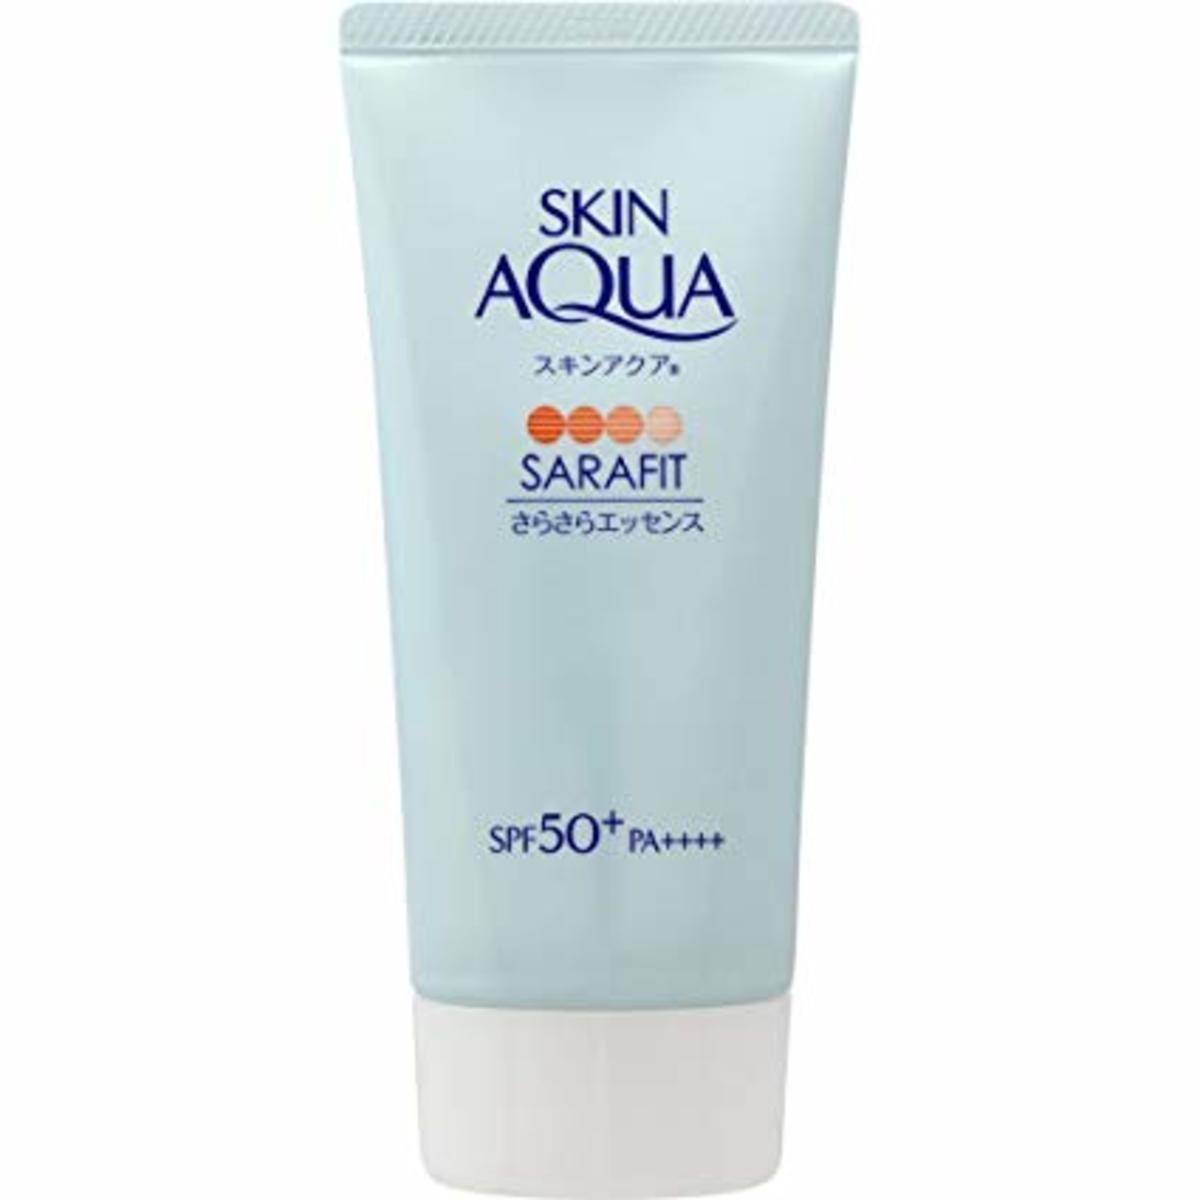 SKIN AQUA 抗UV清爽保濕防曬霜 無香 80g (平行進口貨品)